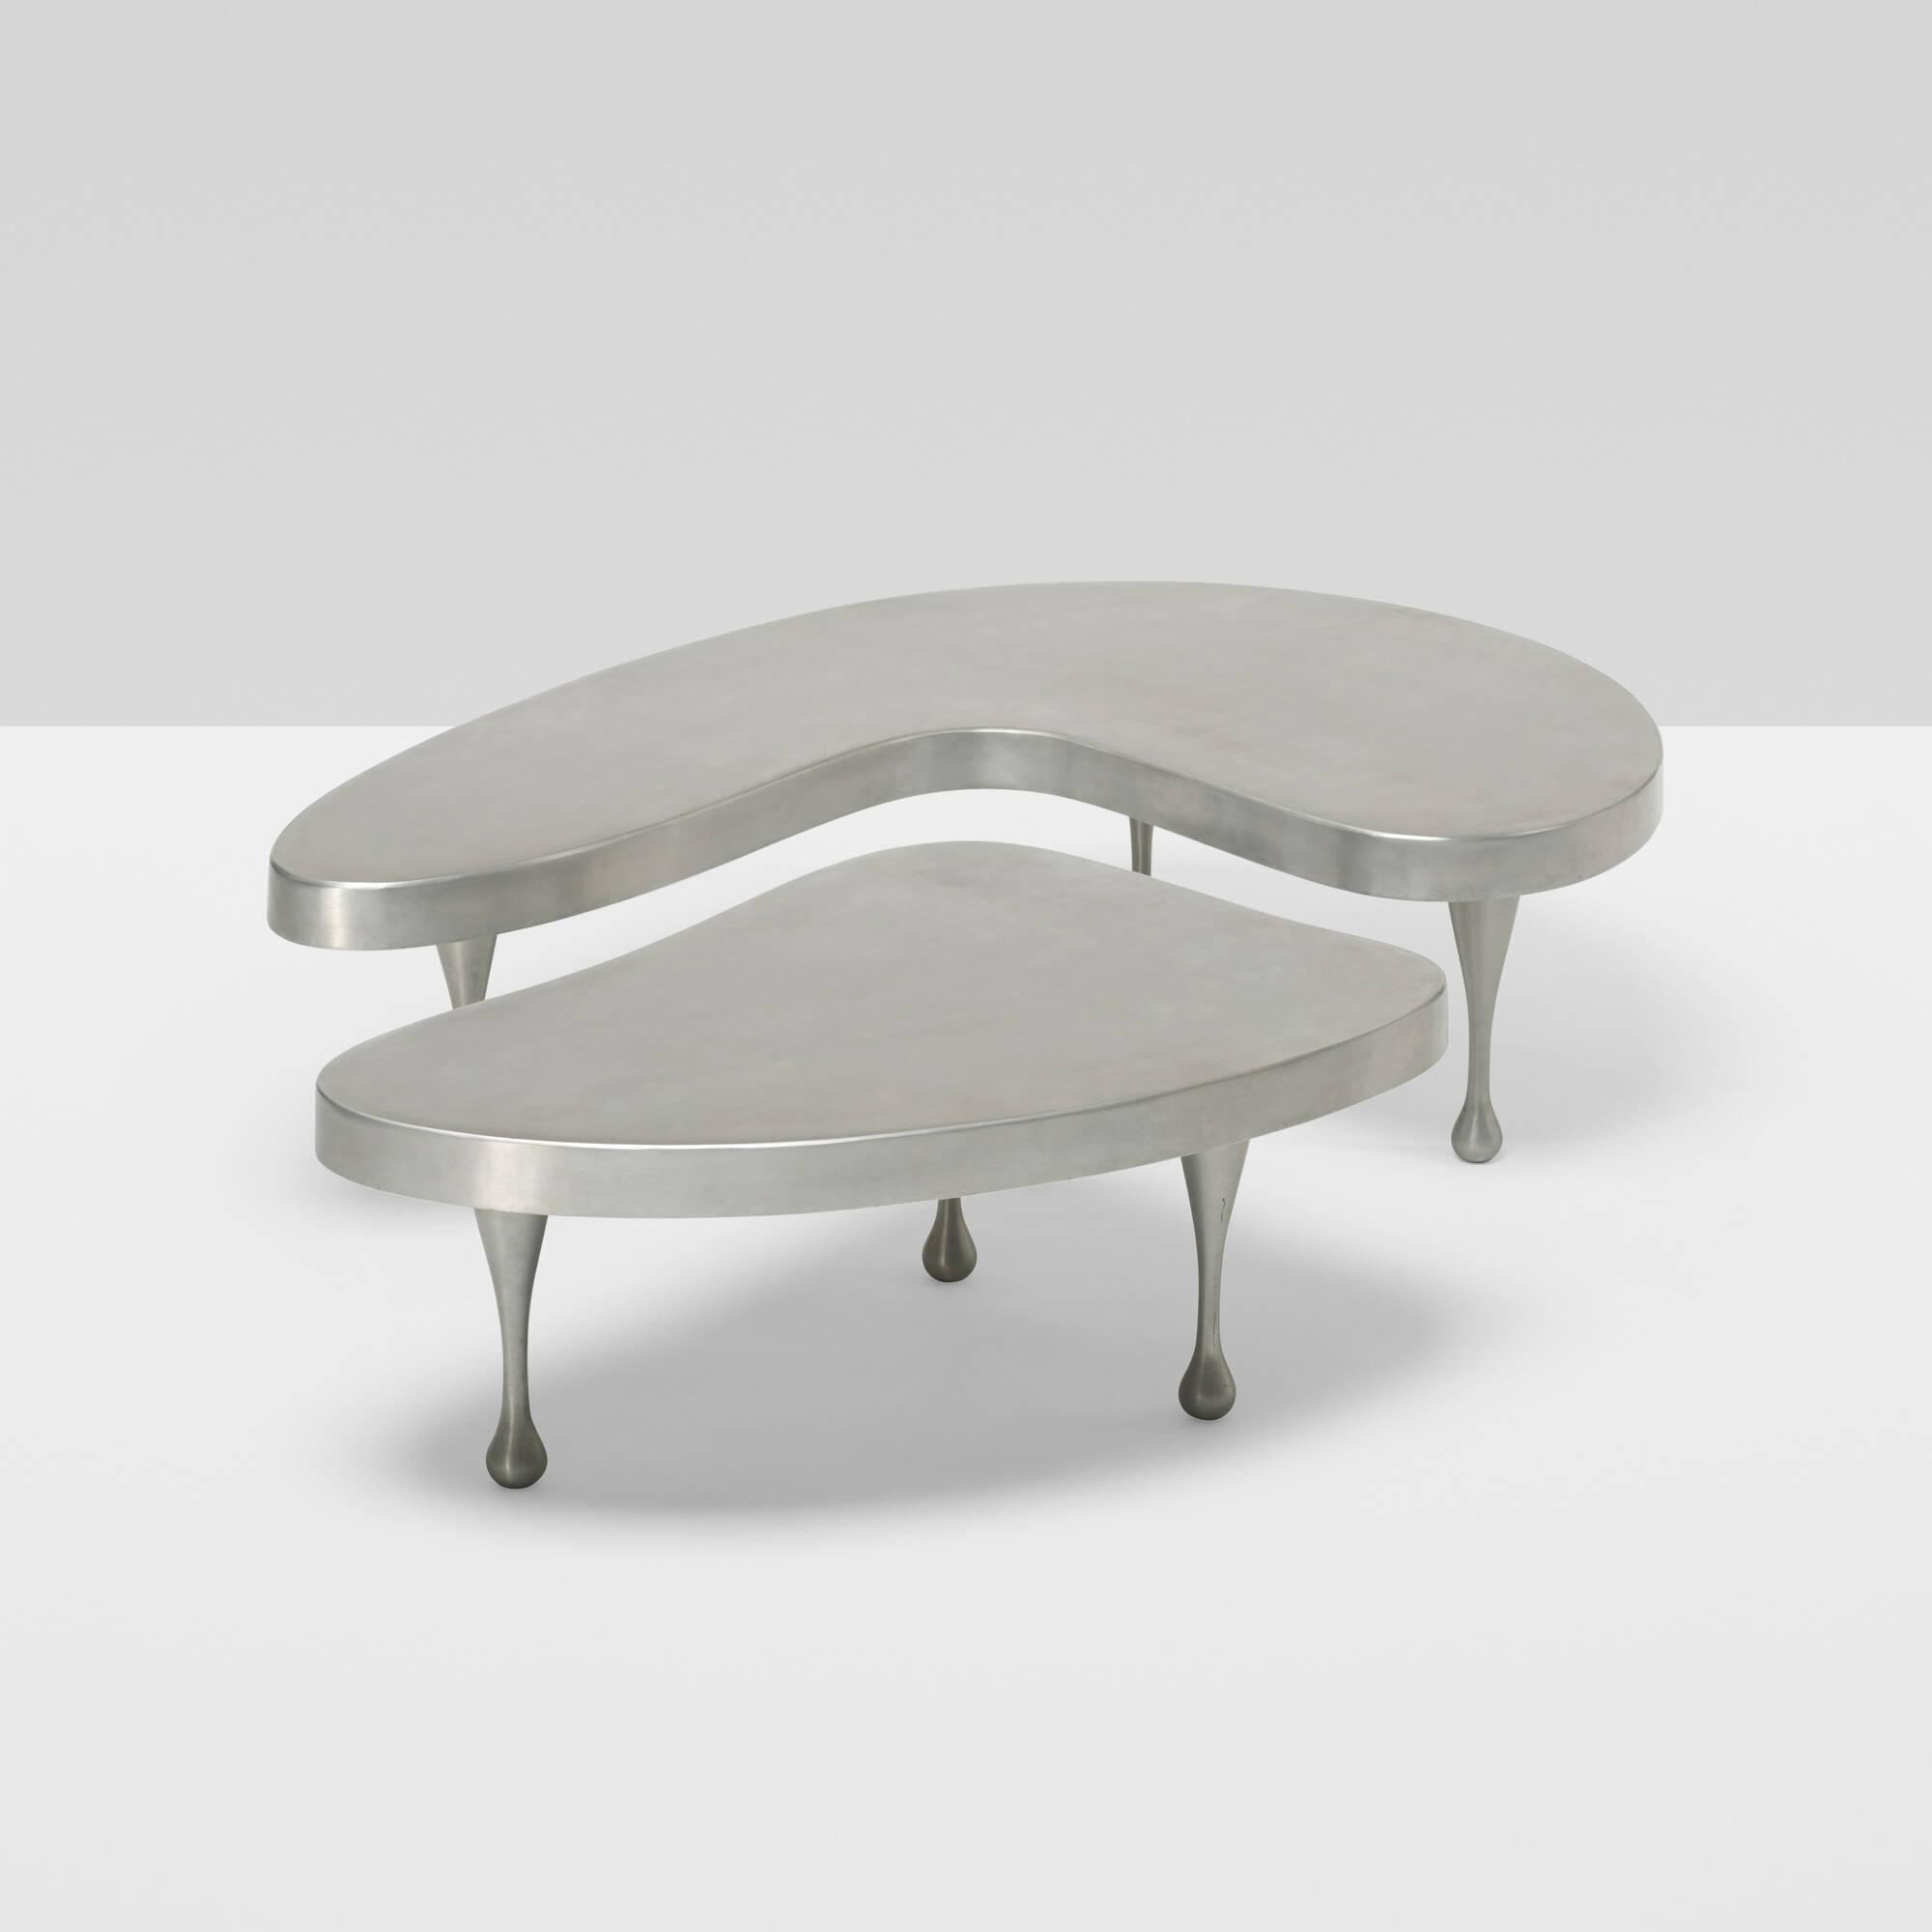 310: Frederick Kiesler / tables (3 of 7)